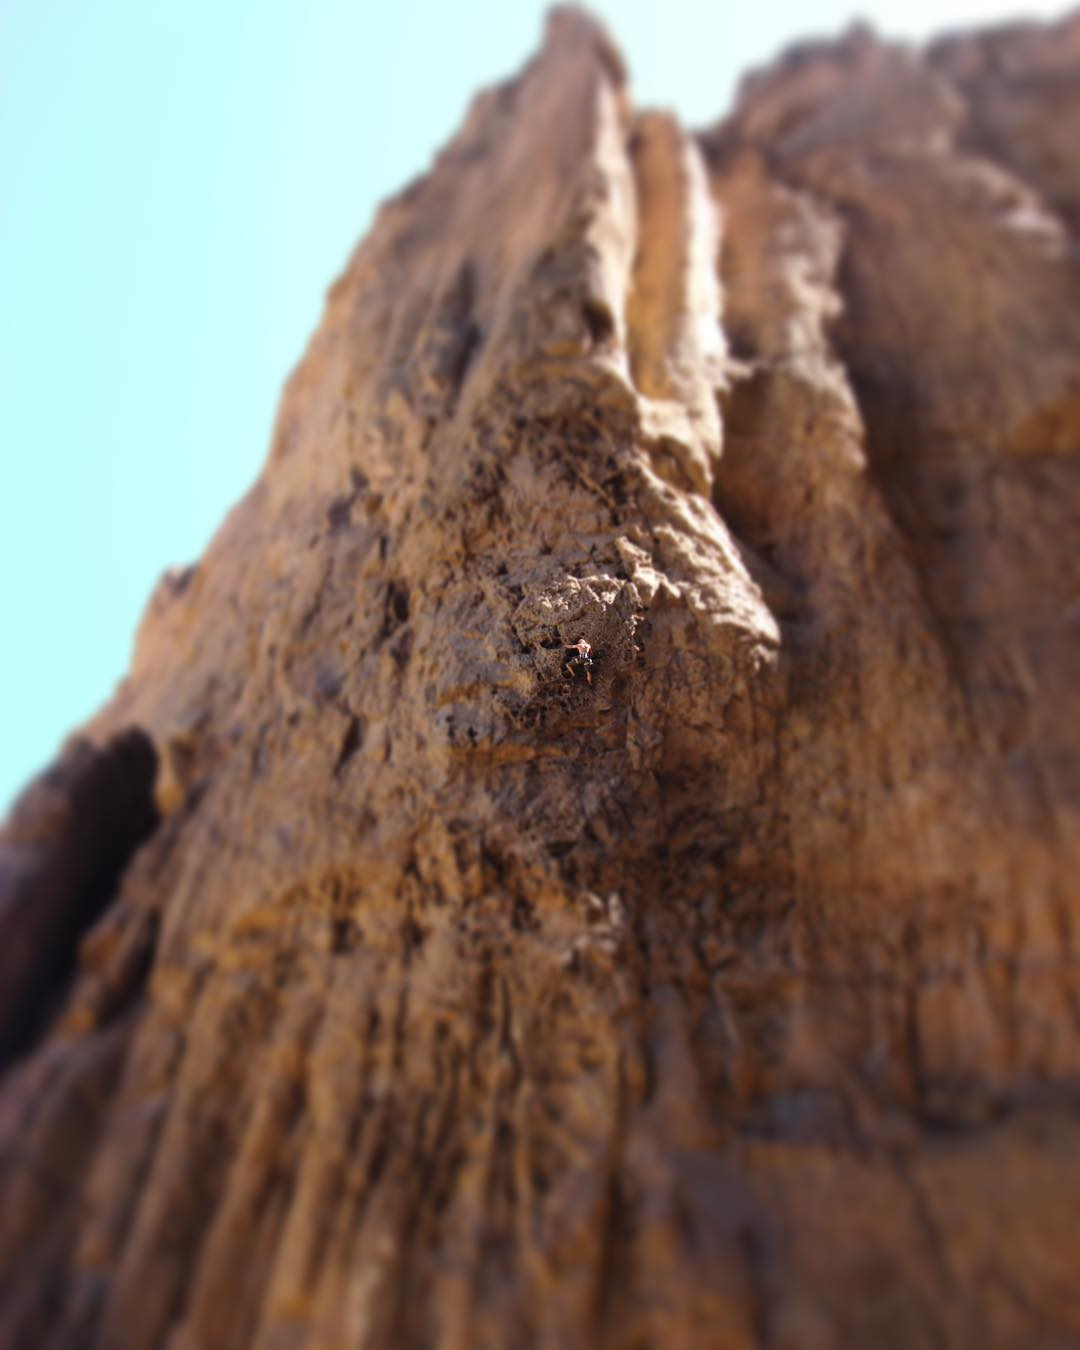 Cañadon de la buitrera Ivan Müller 6a / 6b, 45m #piedraparada #climbing #patagonia #argentina #embajadordelosandes